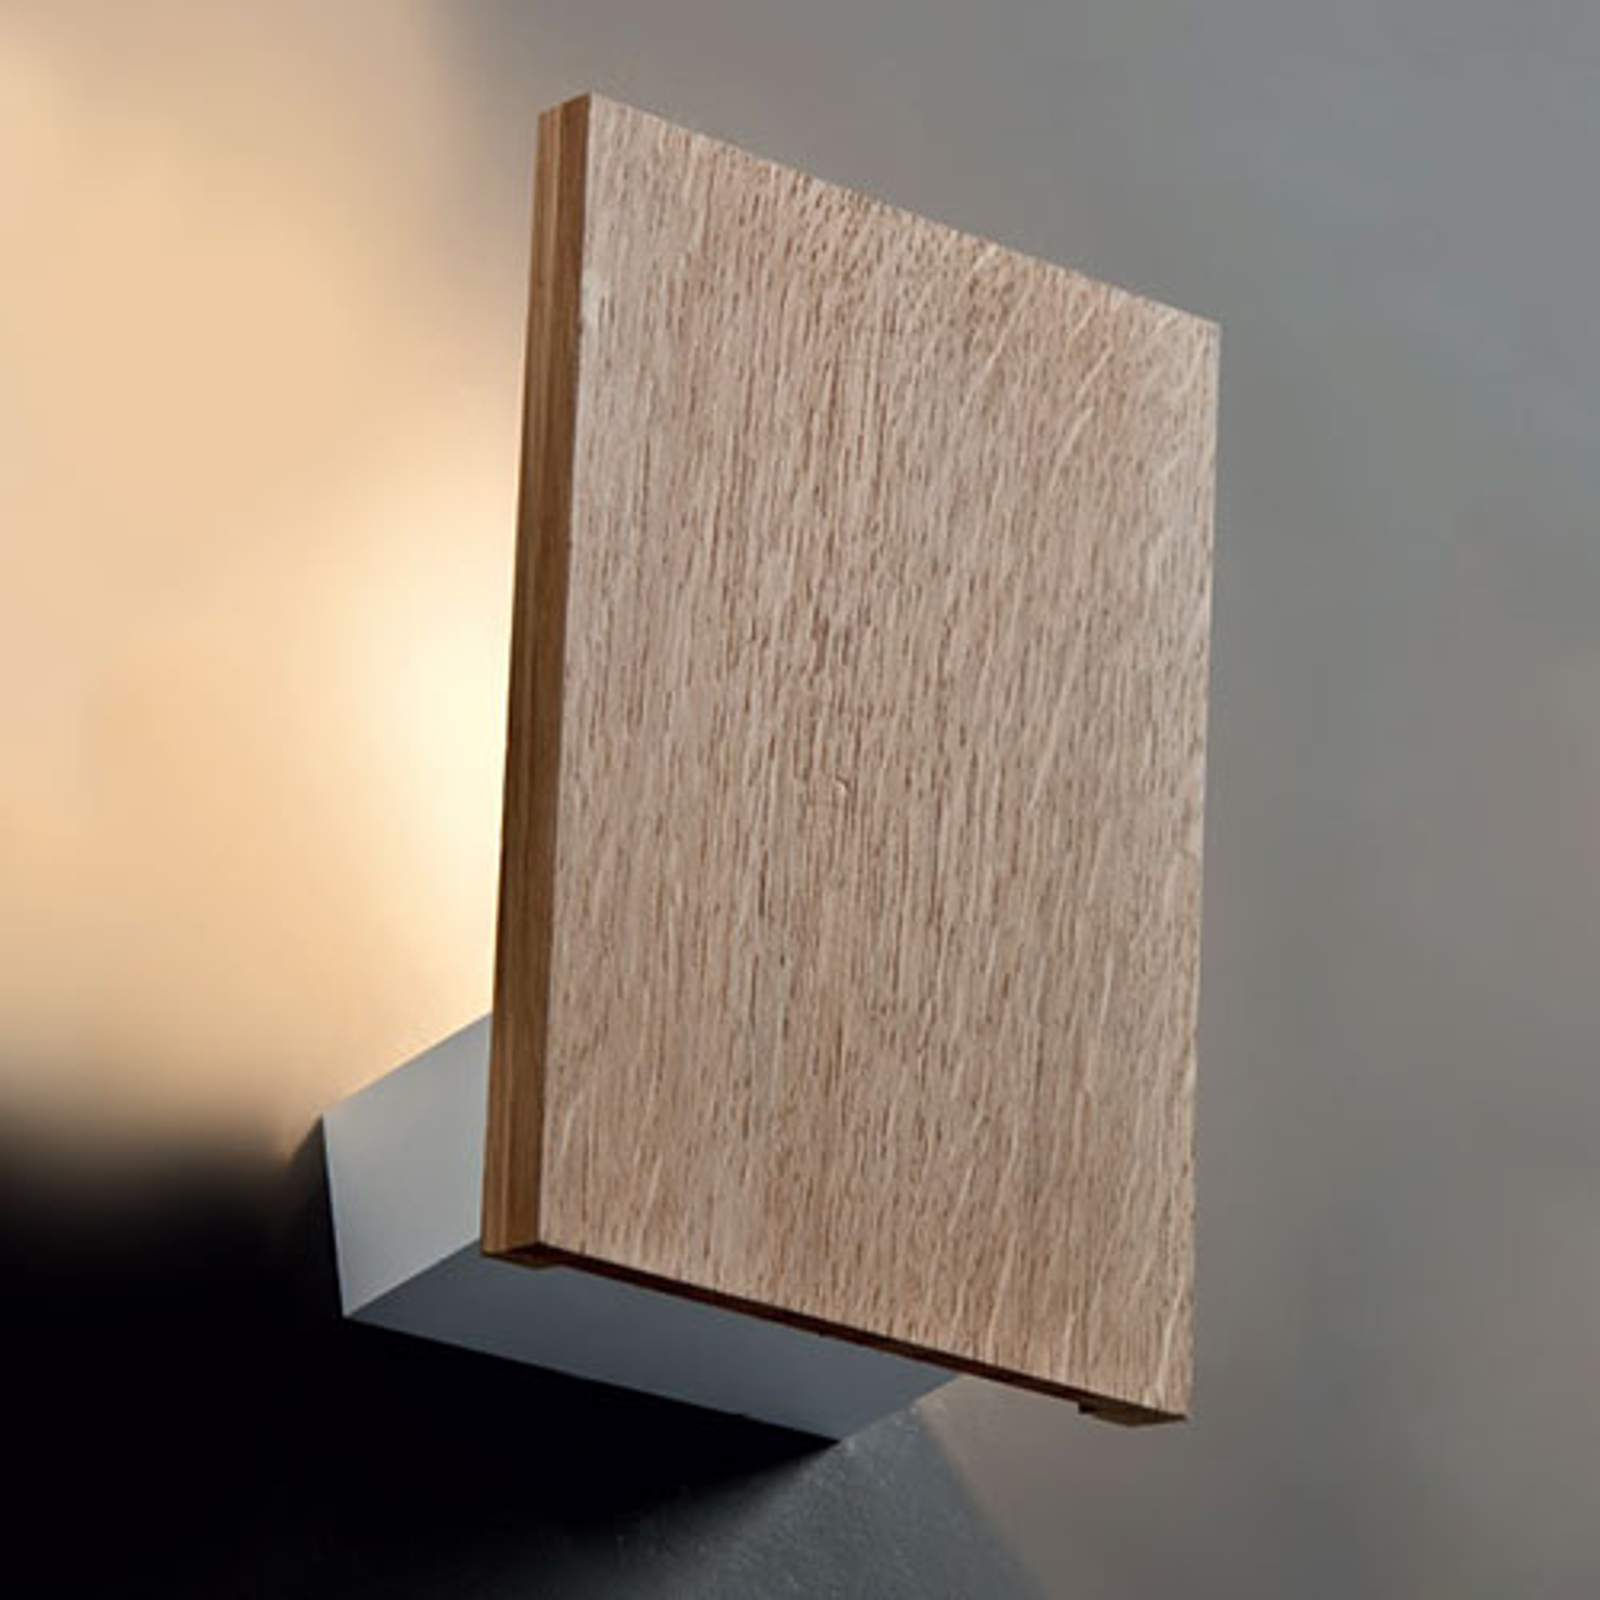 Houten wandlamp Flat met LED